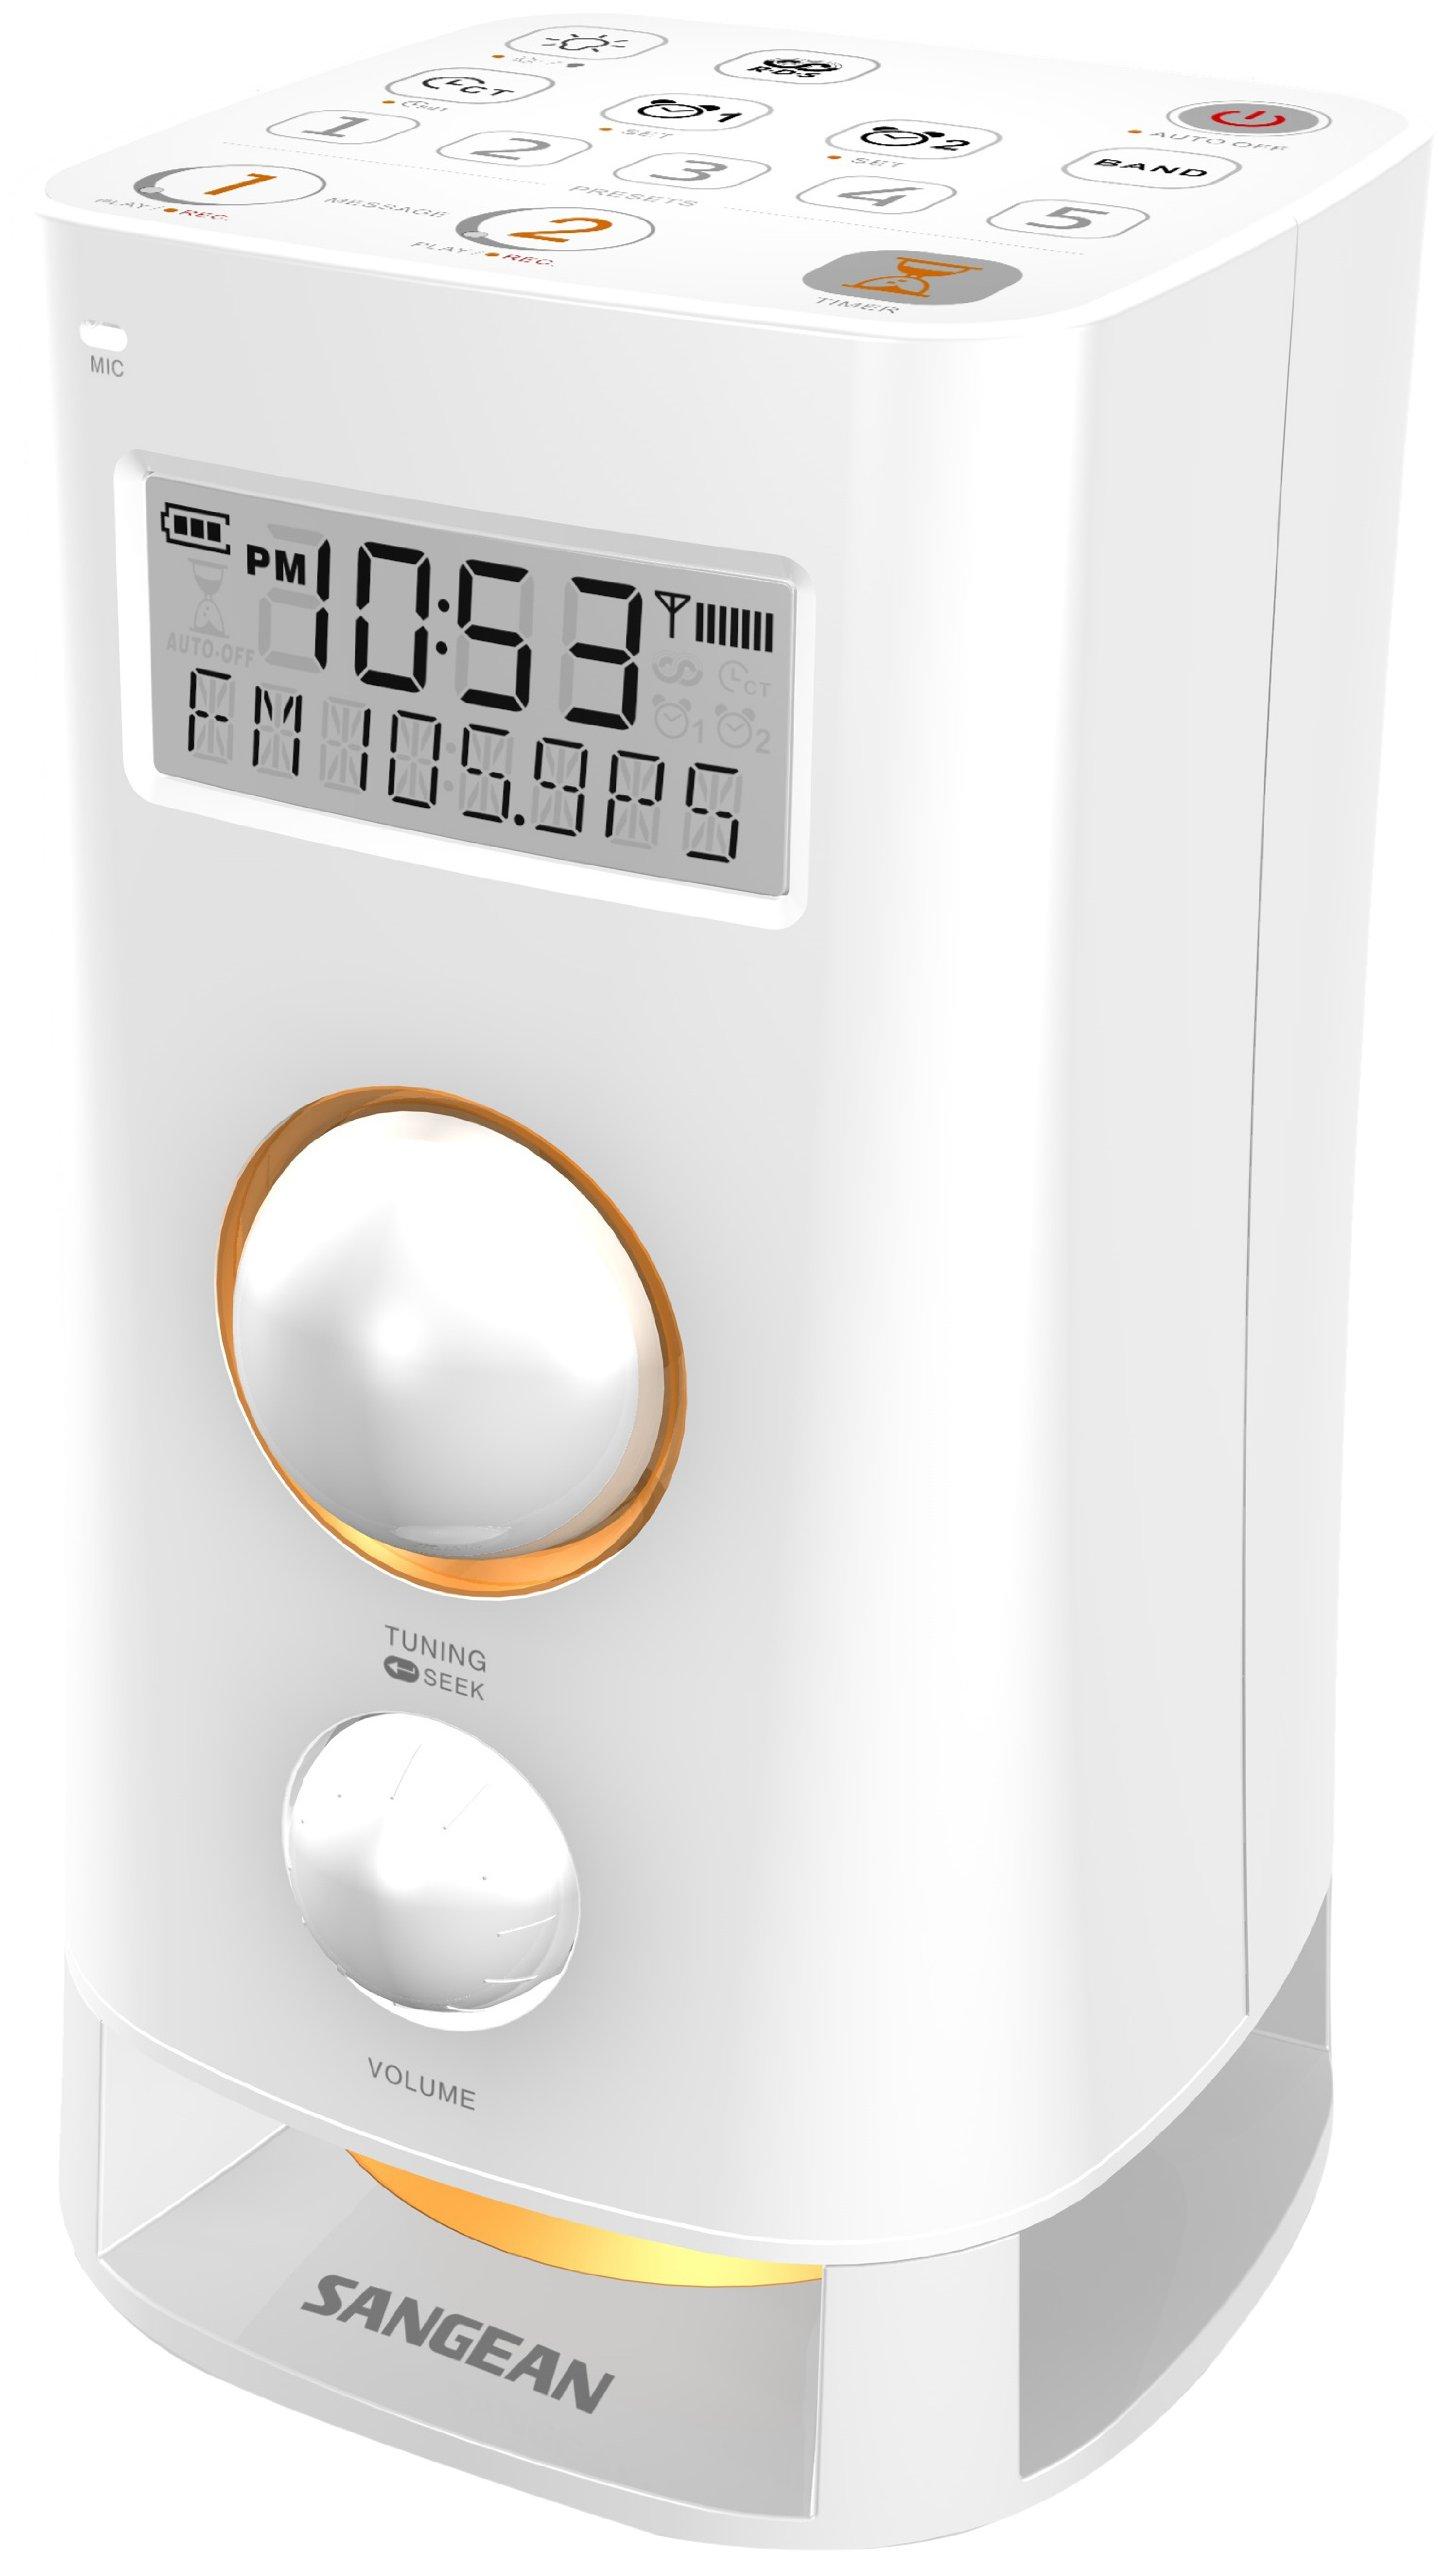 Sangean K-200 Multi-Function Upright AM/FM Digital Radio